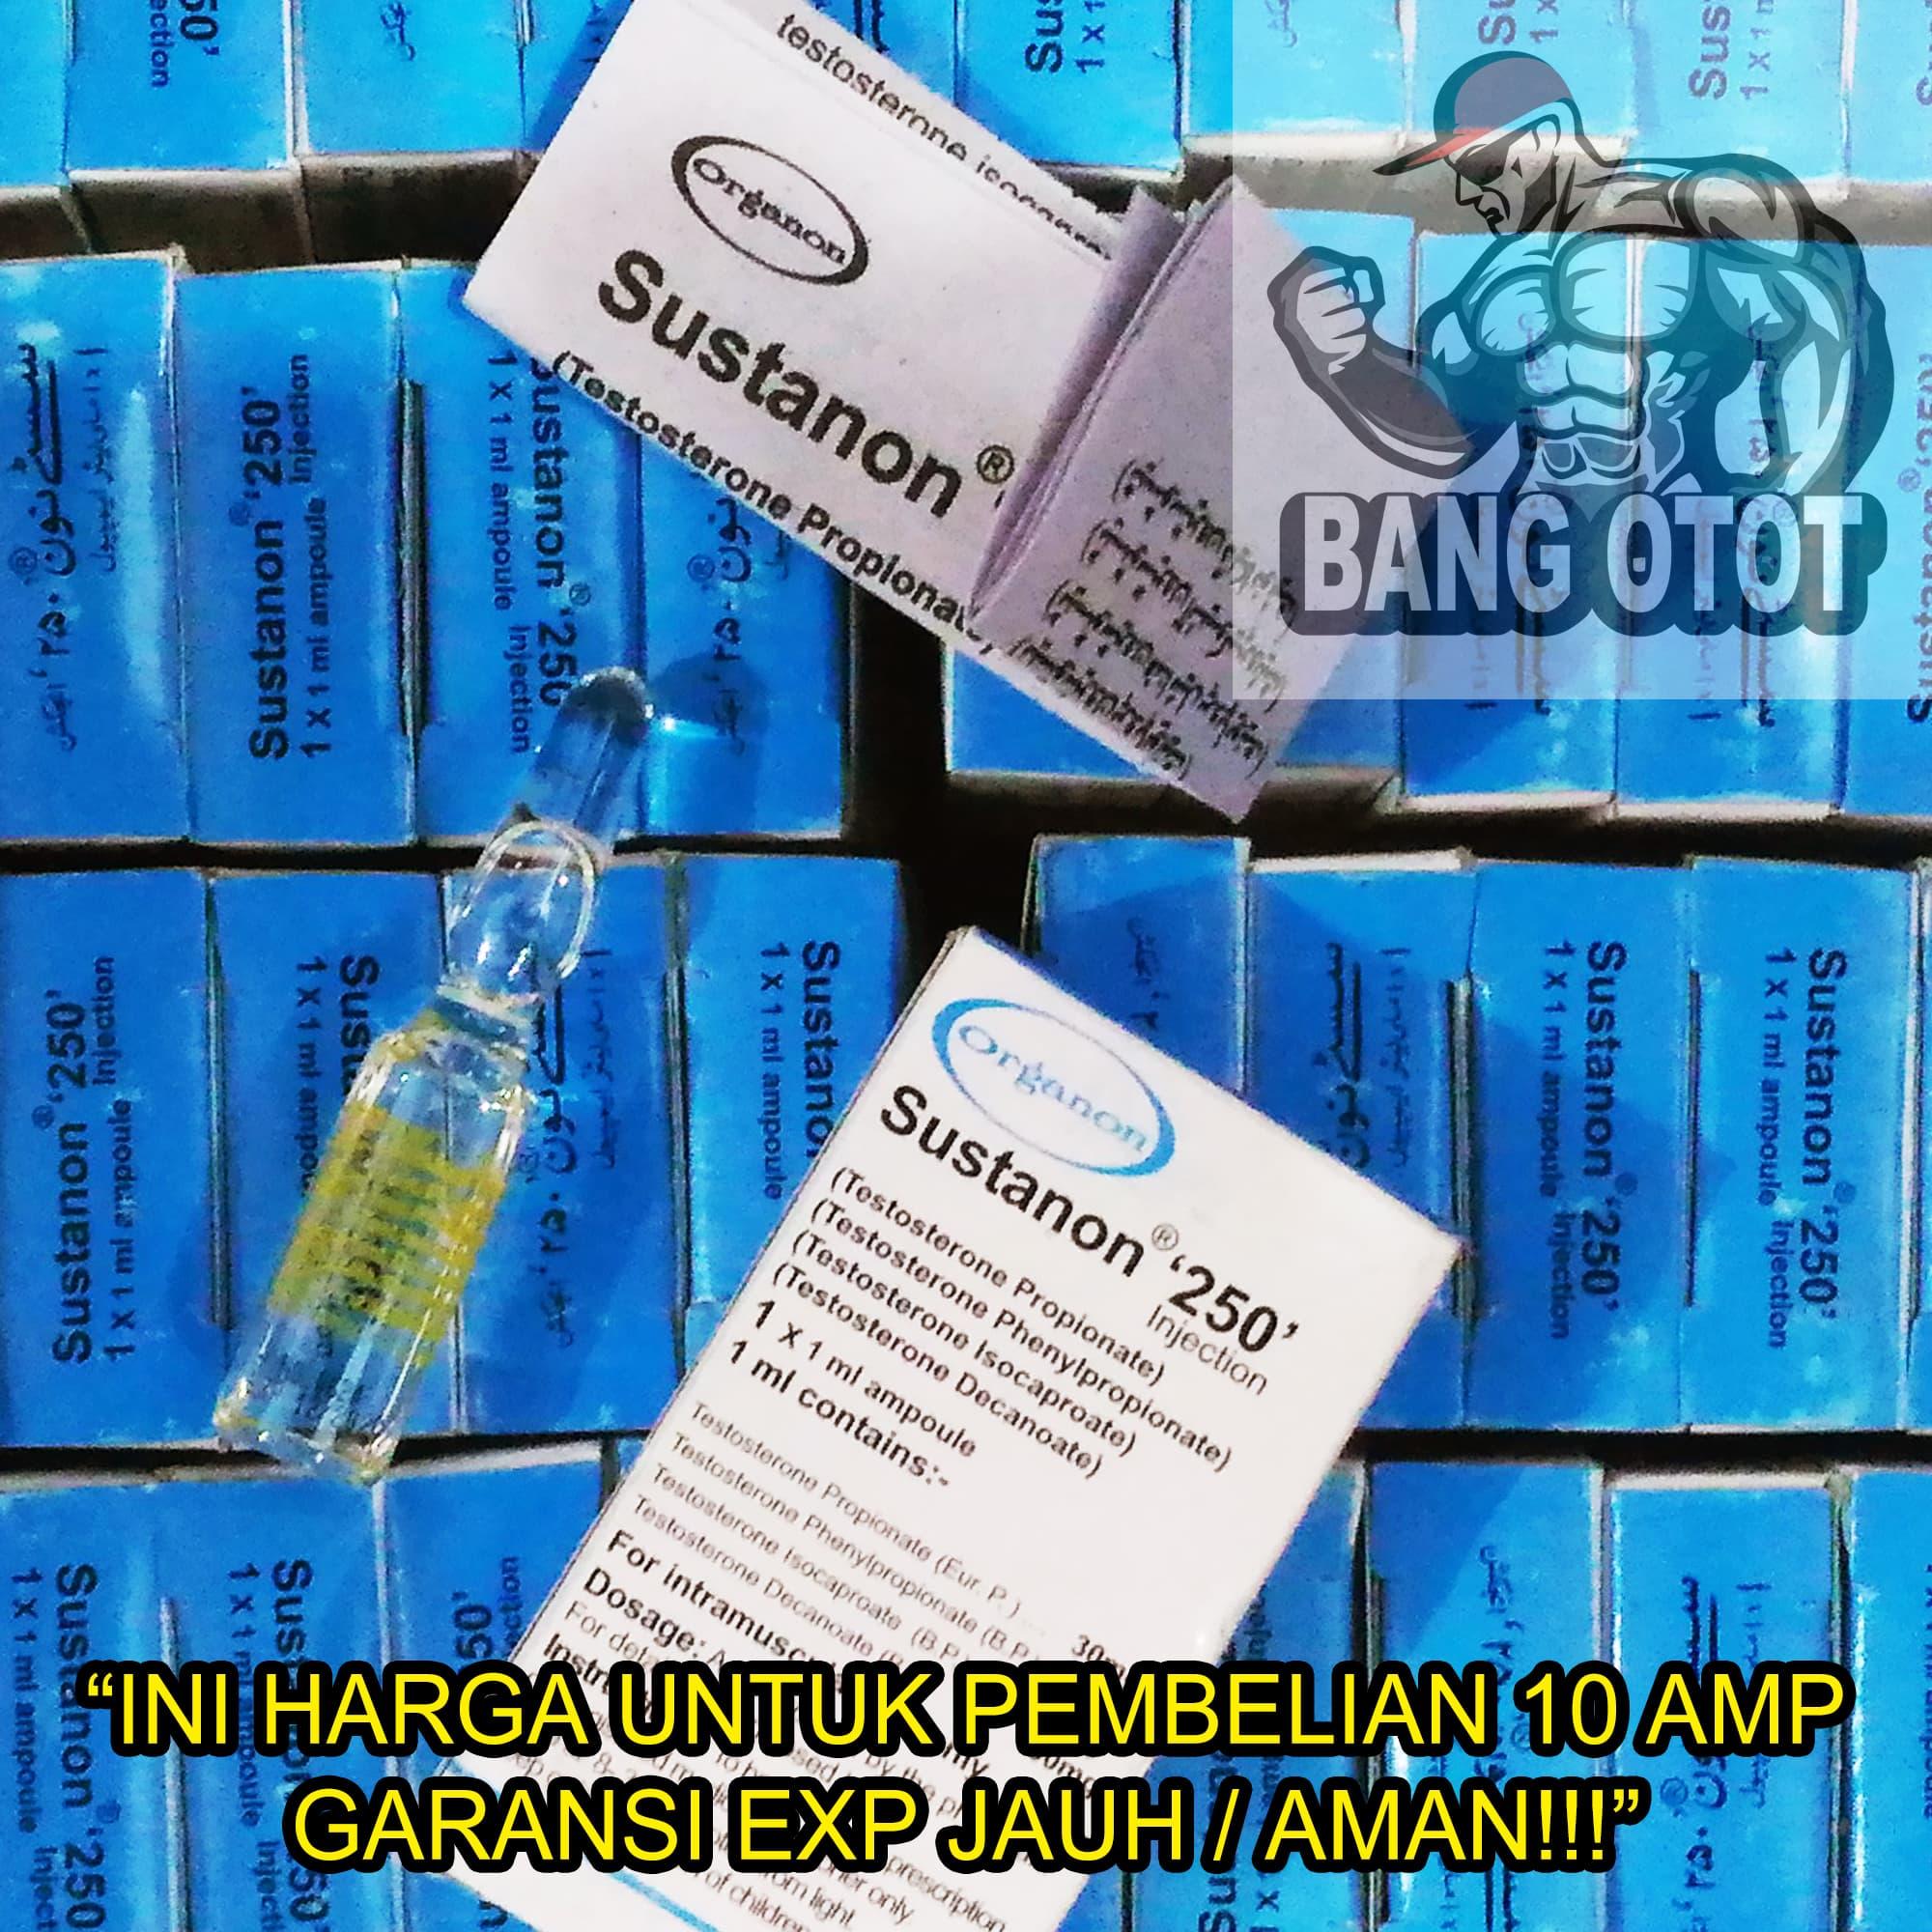 Jual Harga Per 10 Amp Organon Sustanon 250 Sustanon250 Bang Otot Tokopedia